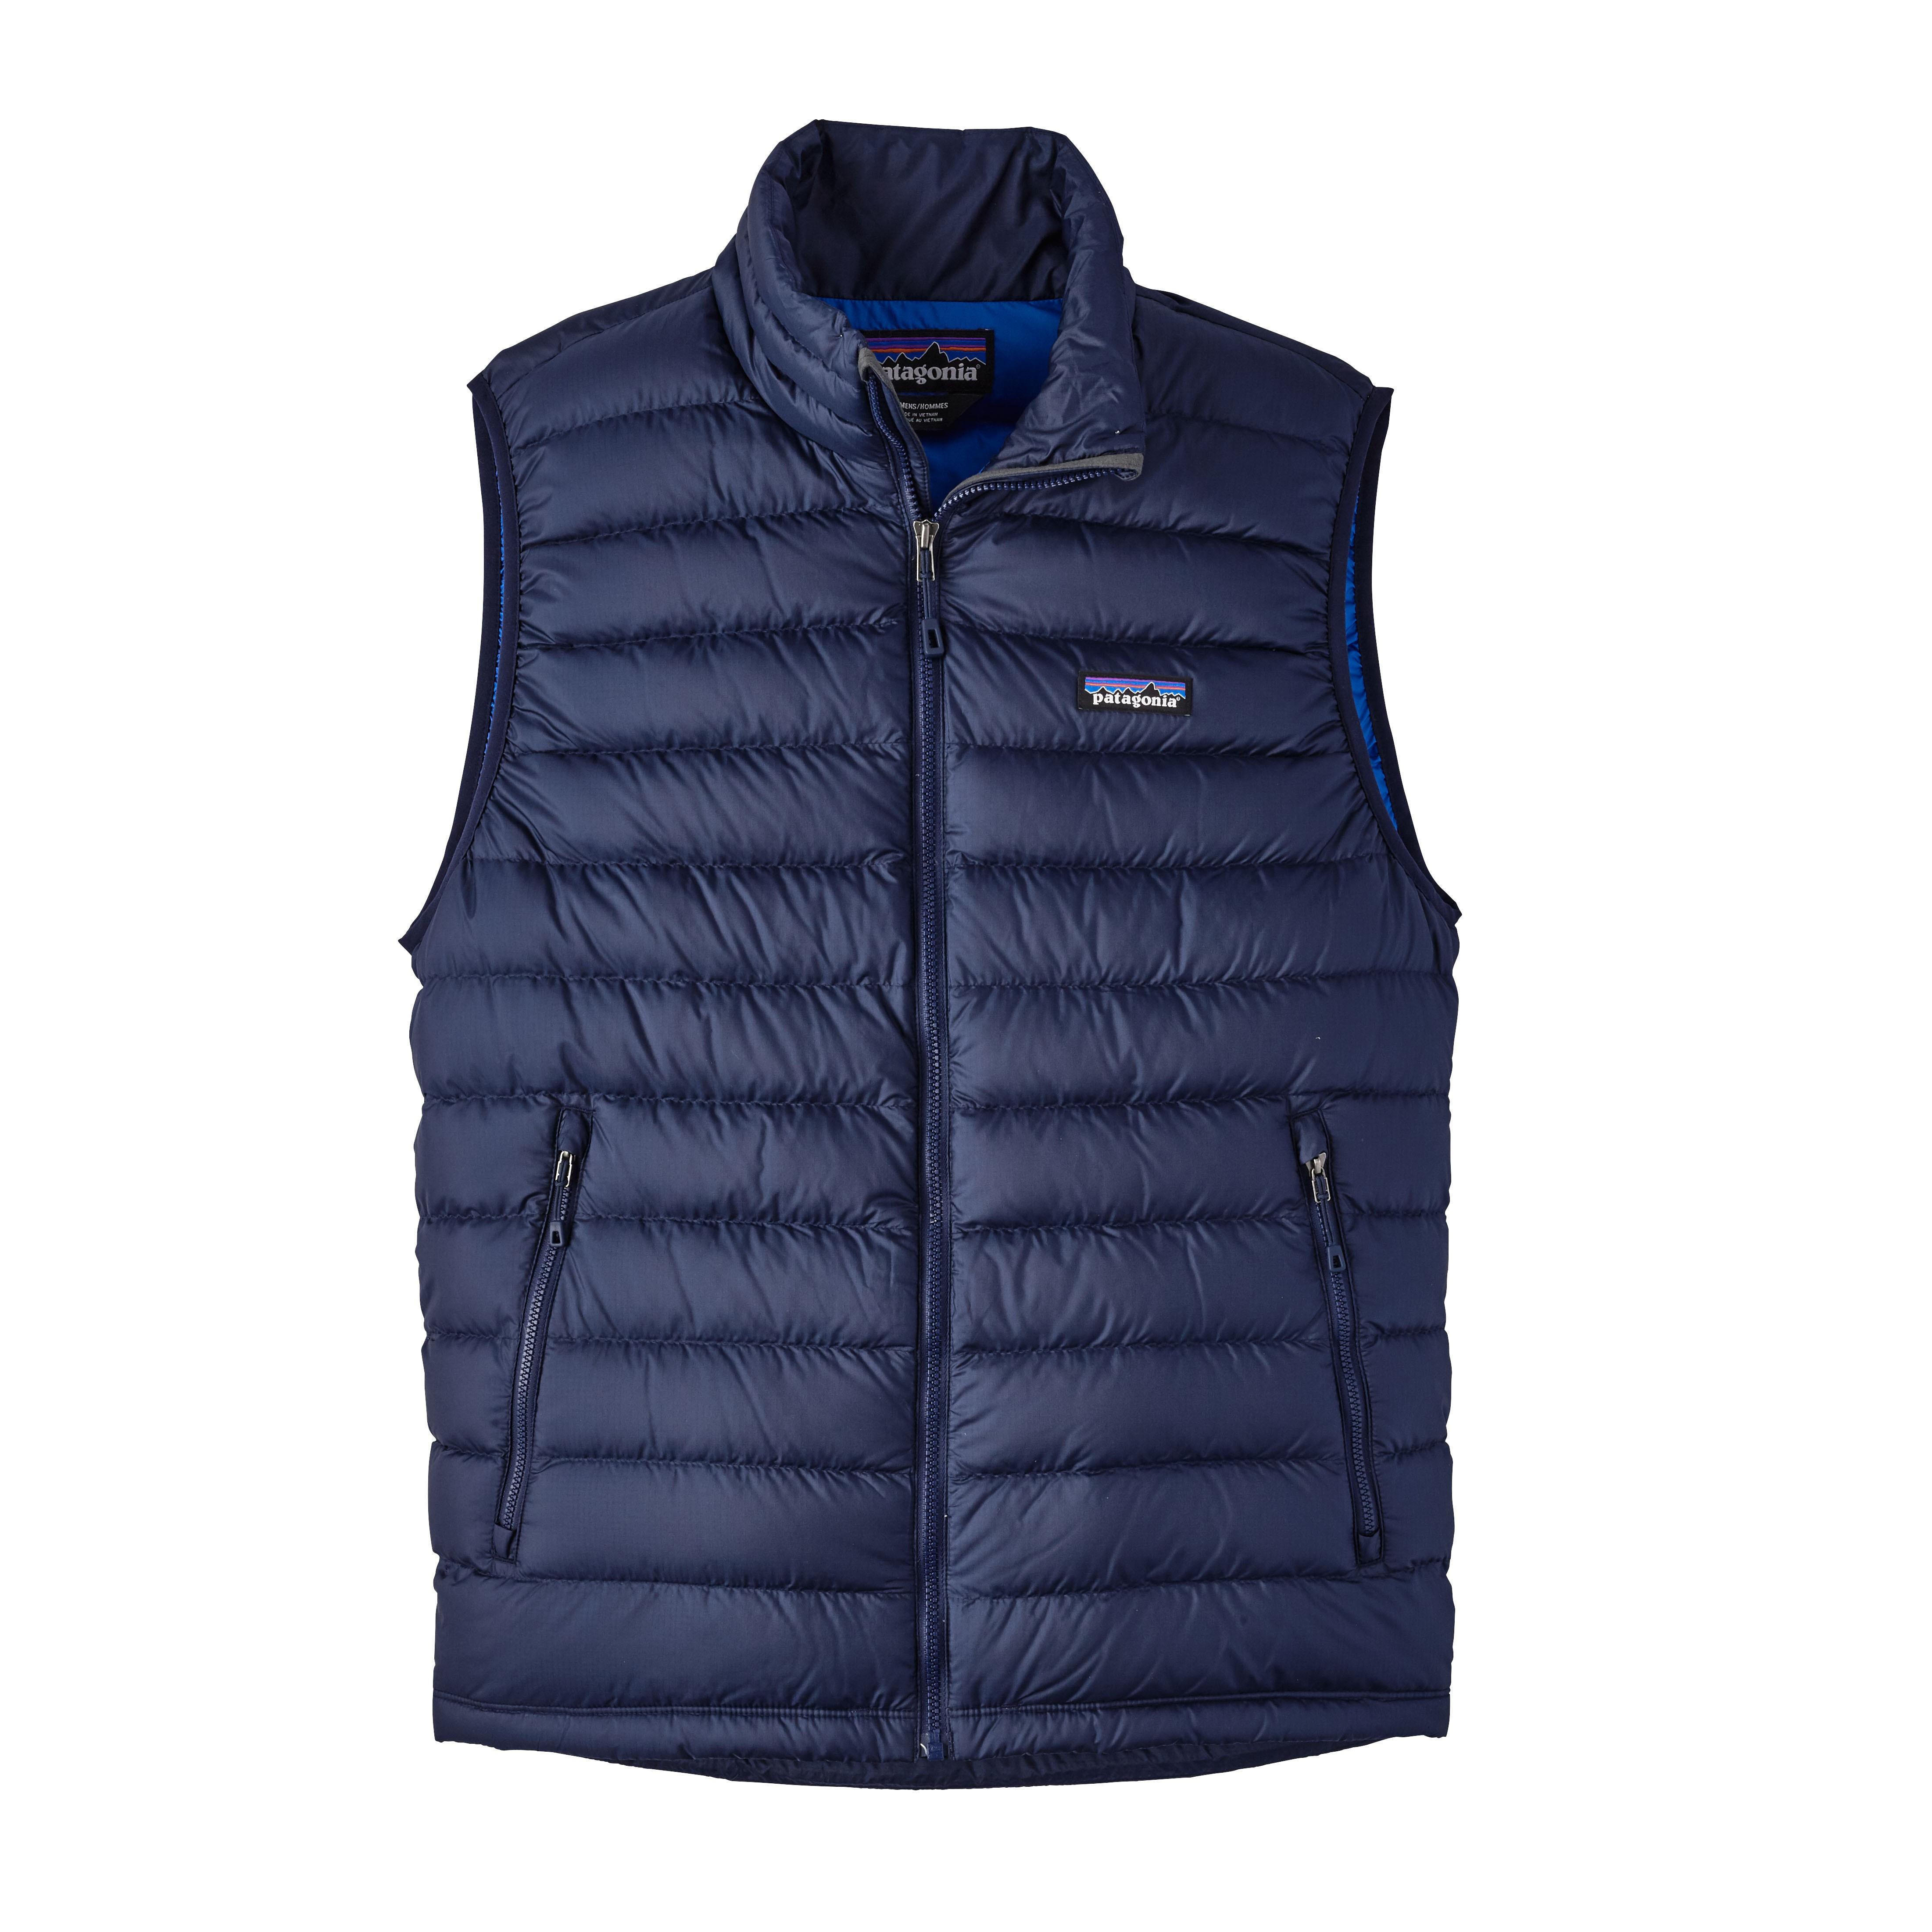 Patagonia Men's Down Sweater Vest : Navy Blue